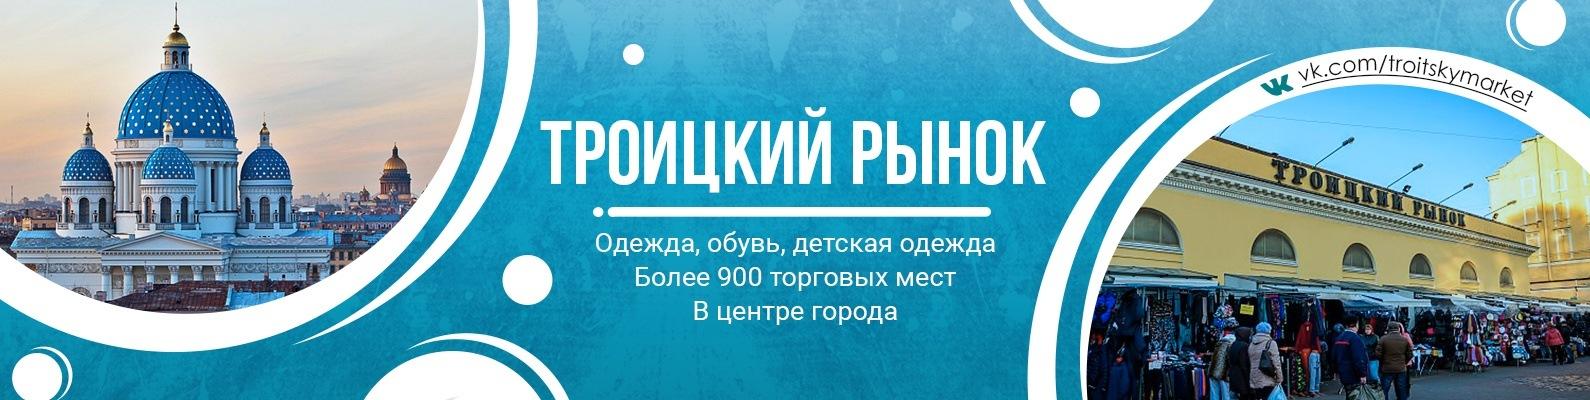 65f904440d7 Троицкий рынок Санкт- Петербург